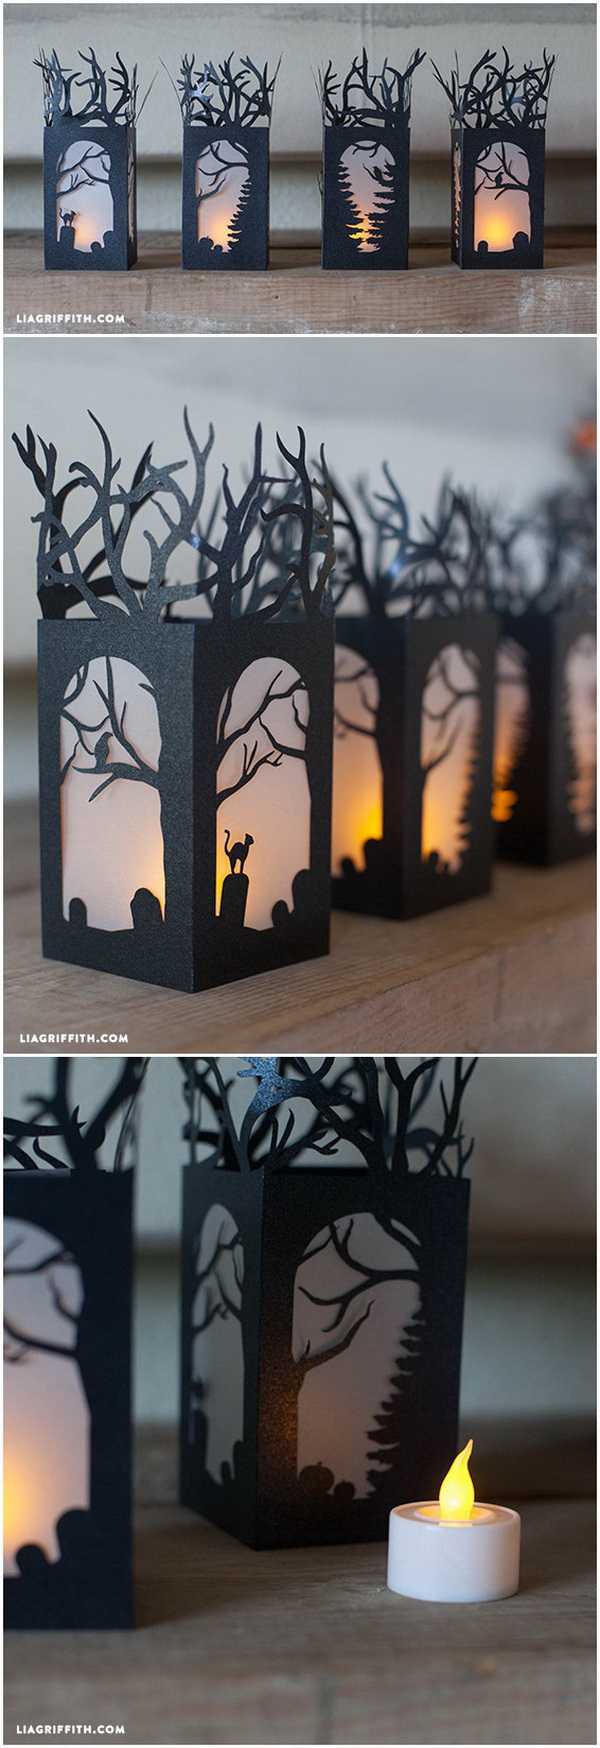 20+ Creative DIY Halloween Decor Ideas - For Creative Juice